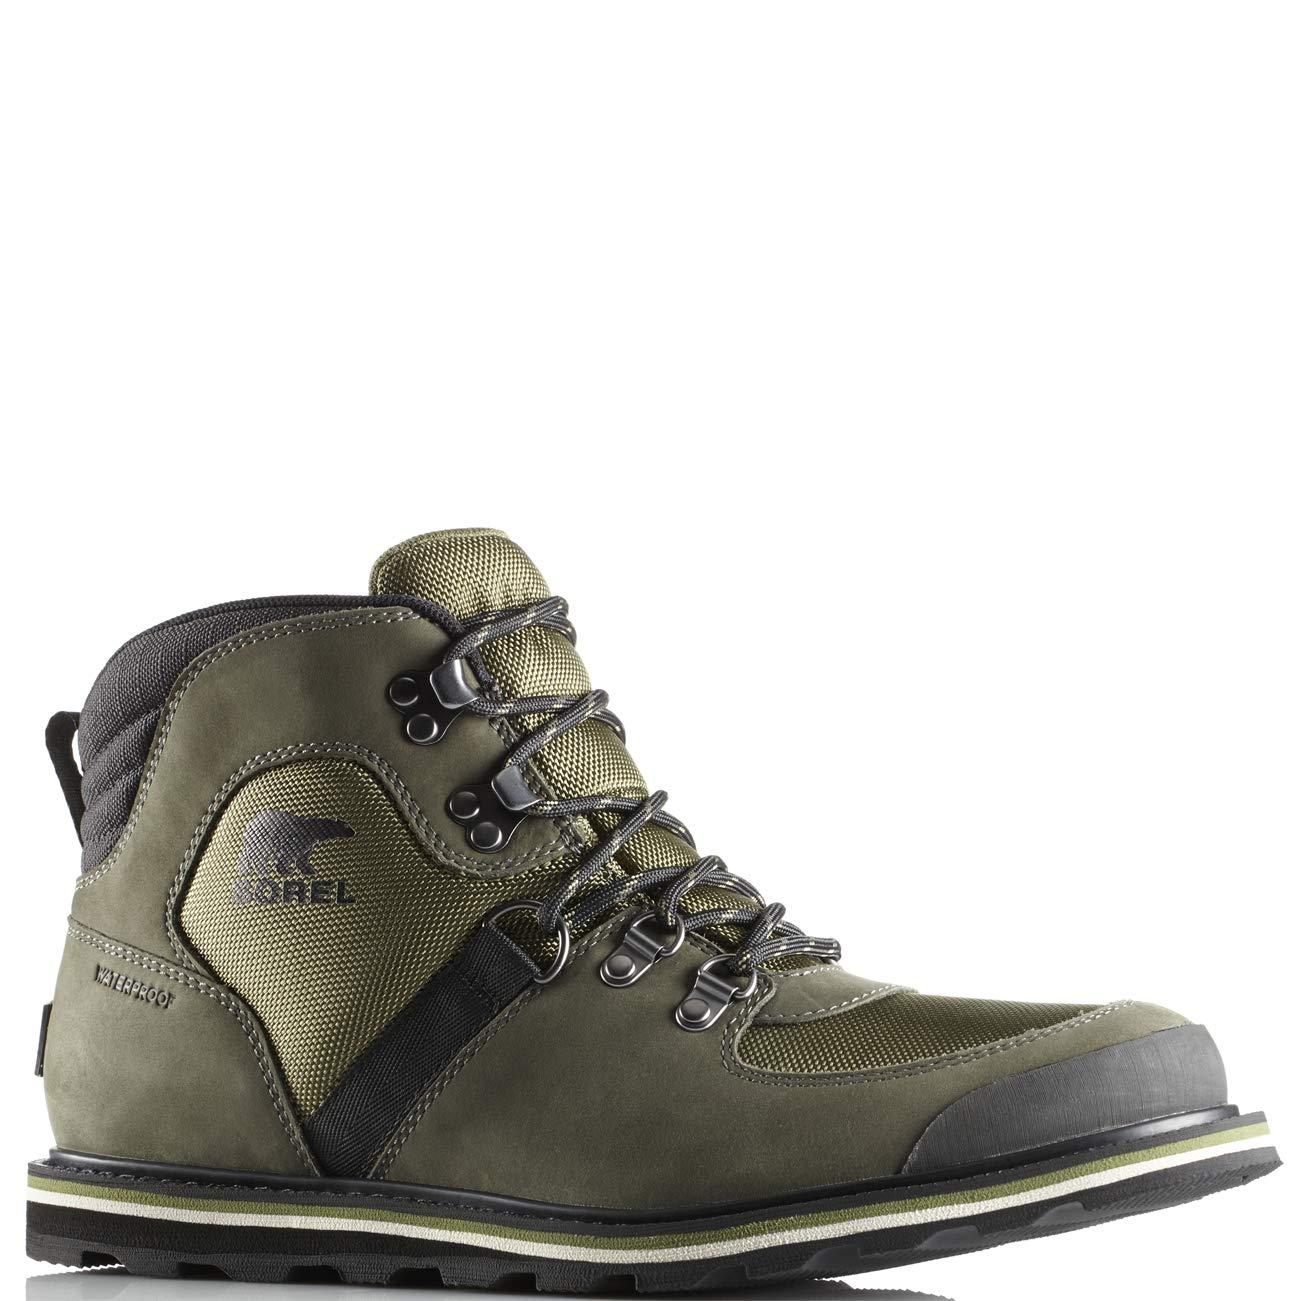 SOREL Madson Sport Hiker Waterproof Men's Lace-up Boots 1808001011-10.5